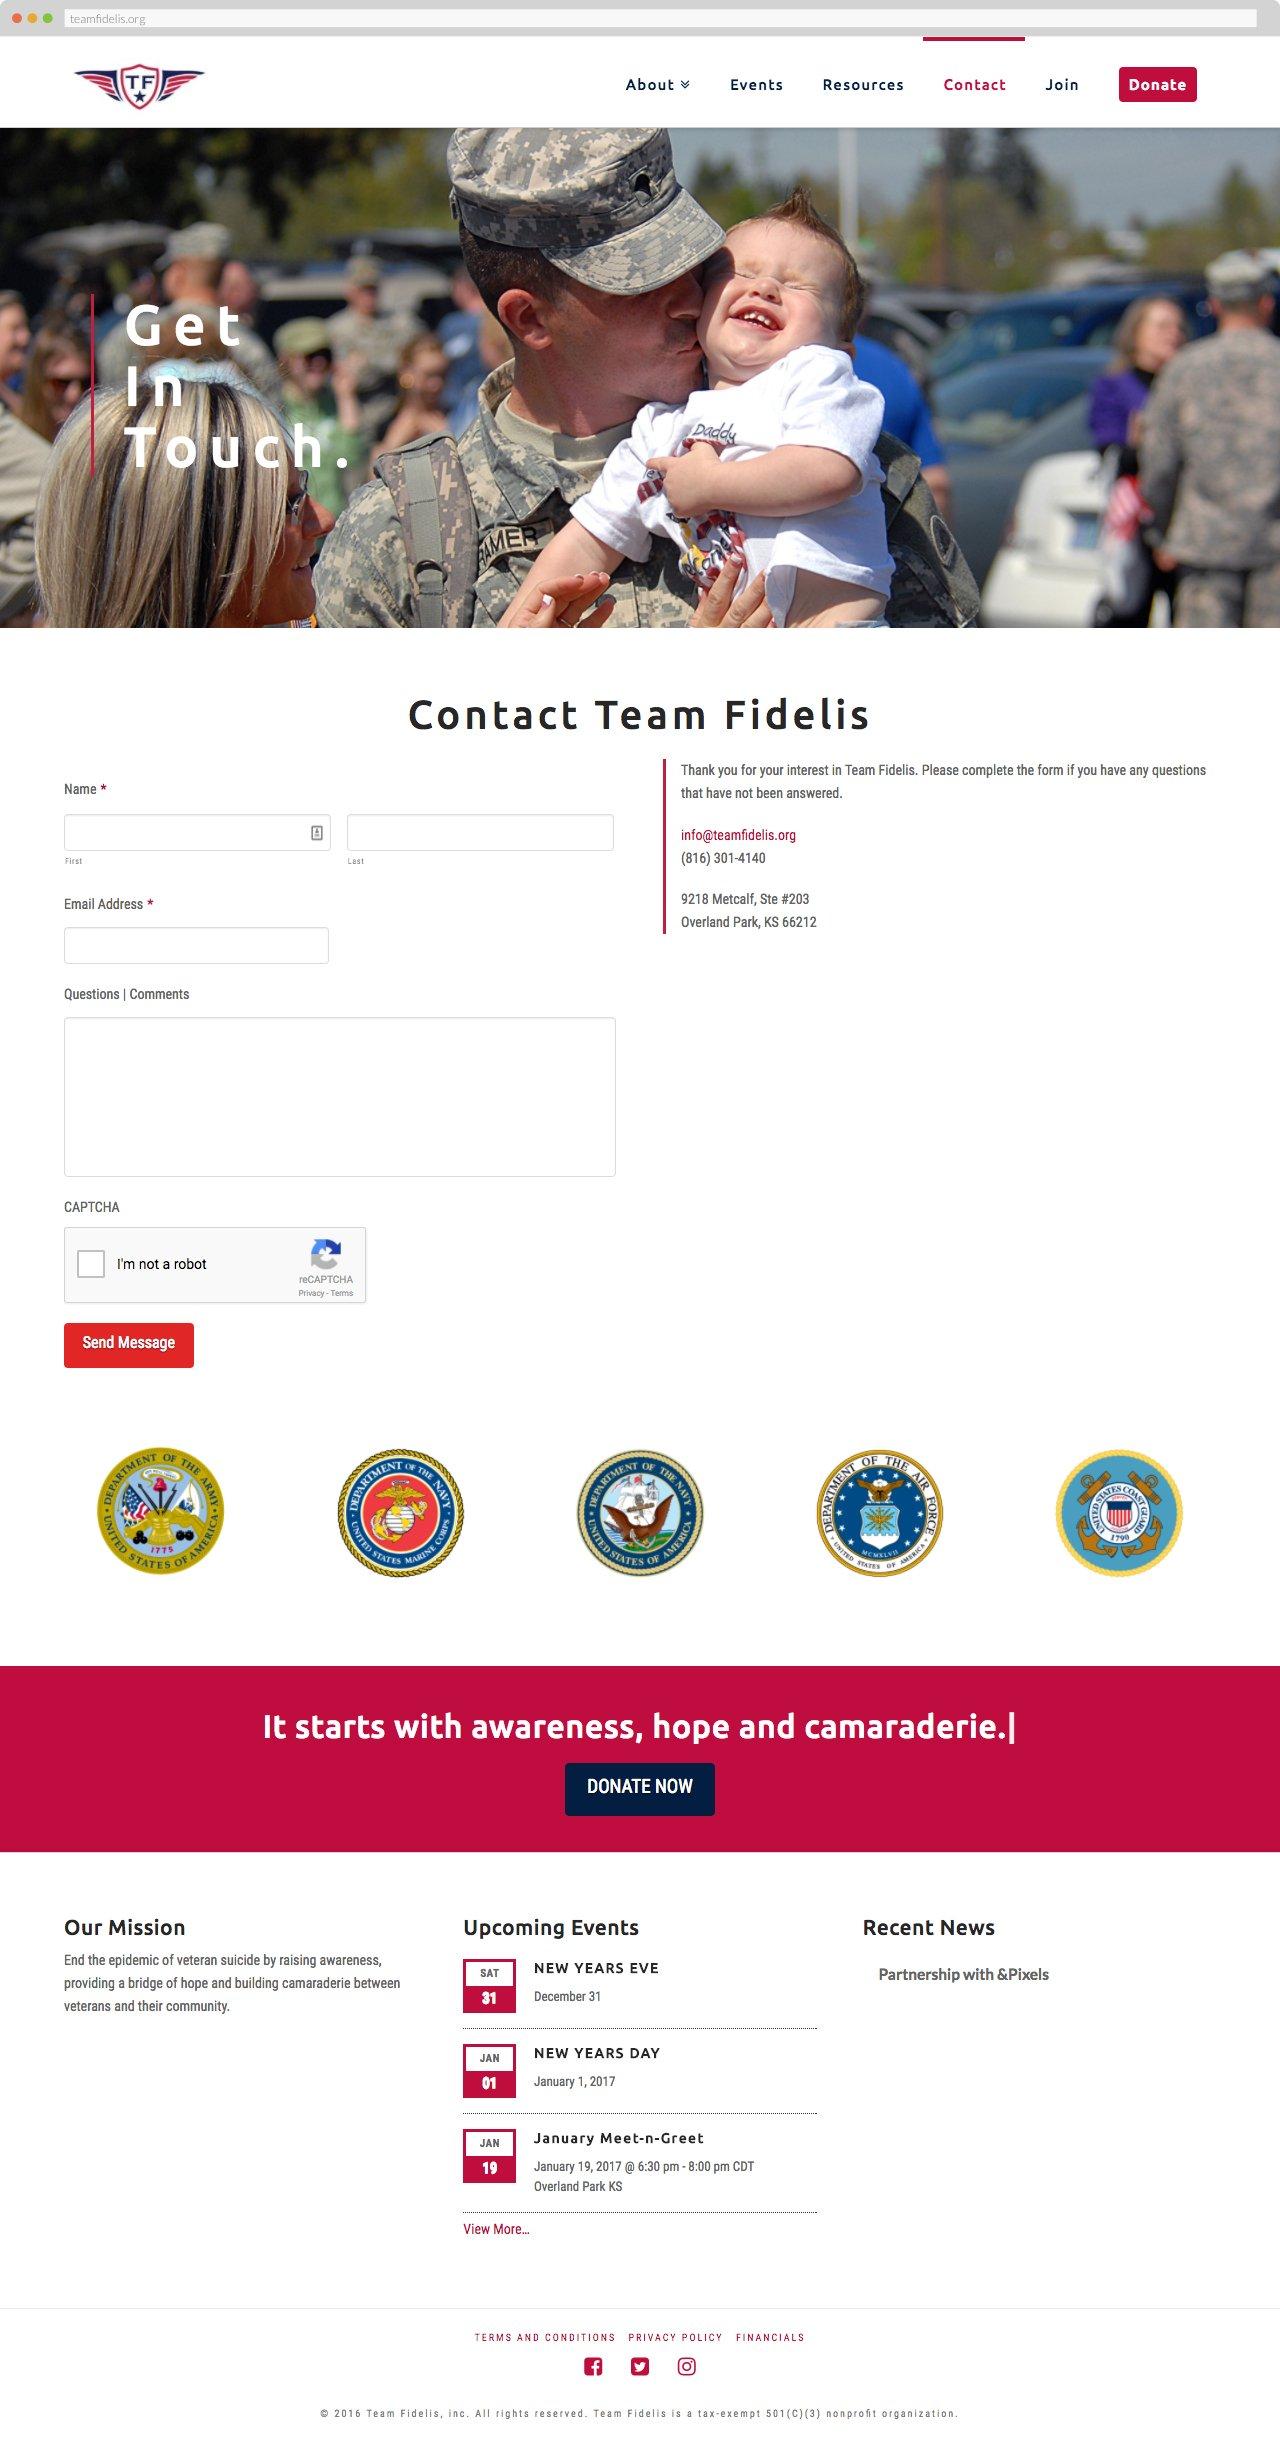 Team Fidelis - Contact Us